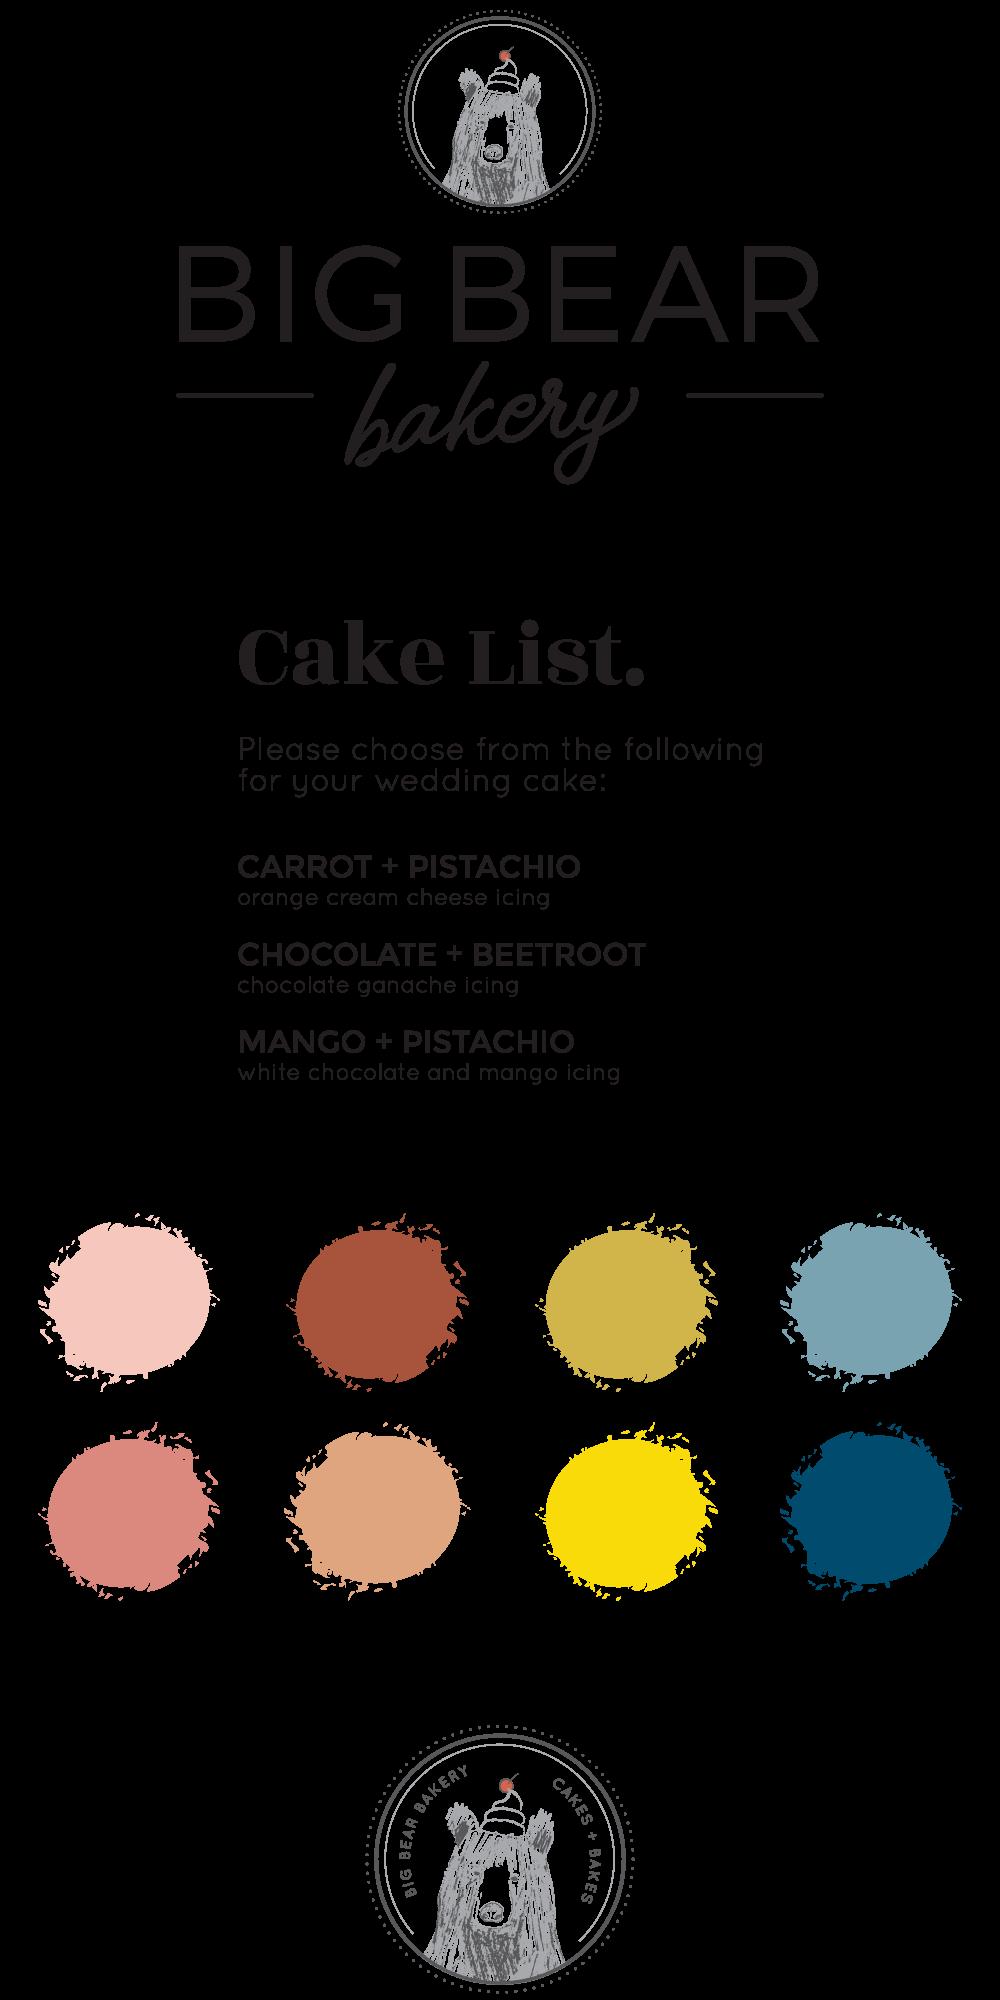 glasgow-branding-design-elements-big-bear-bakery.png